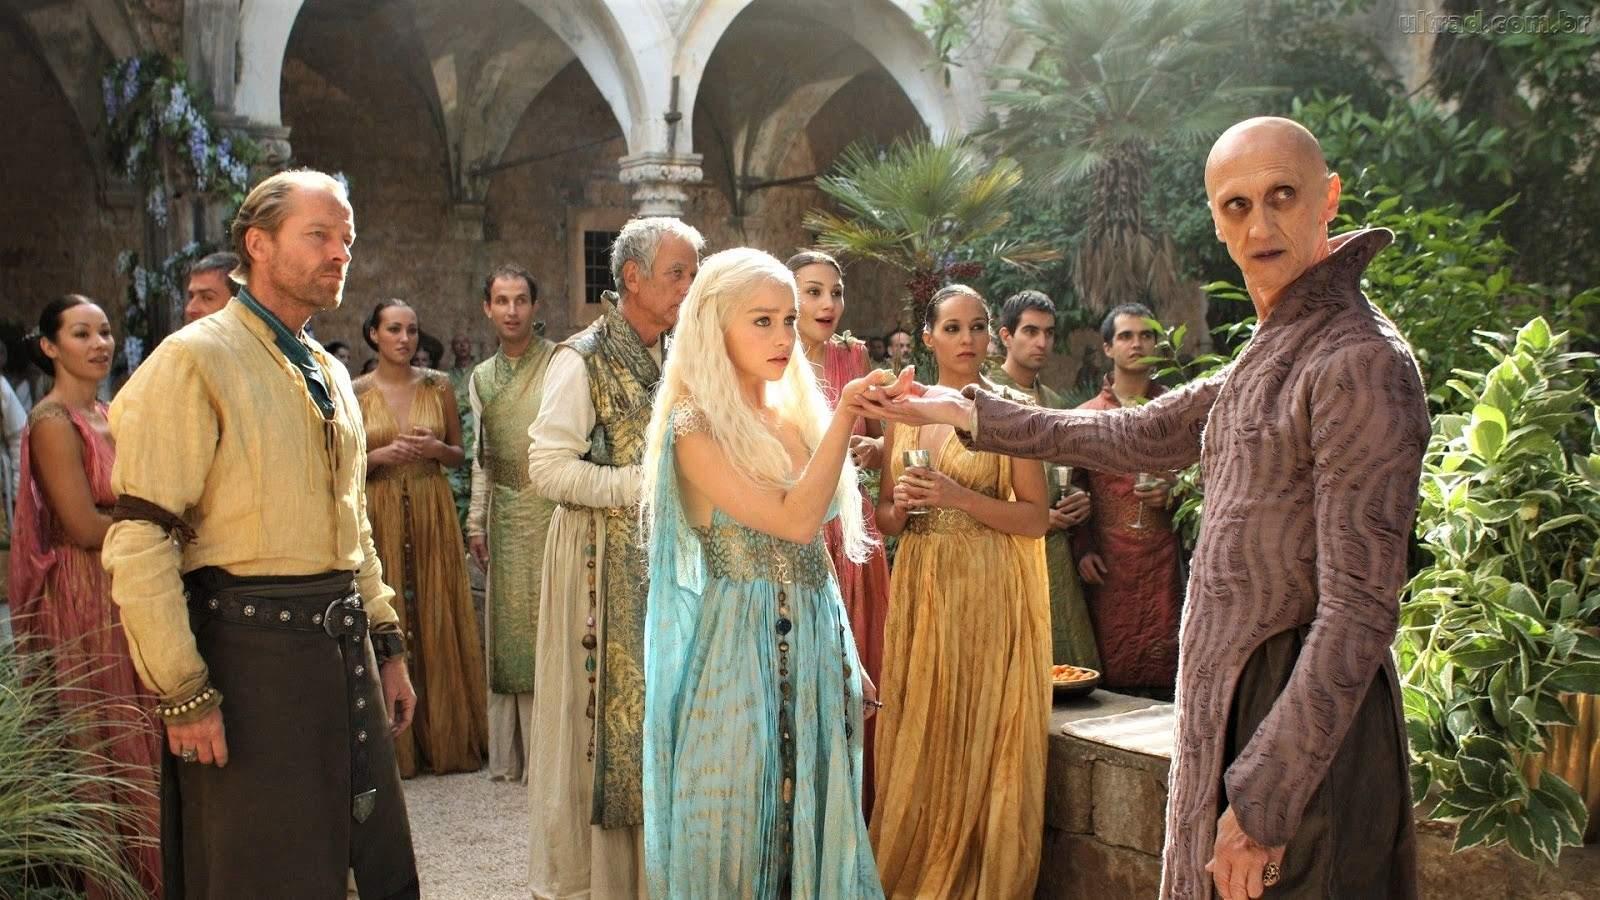 Daenerys-Targaryan-Qarth-Game-of-Thrones-Warlock